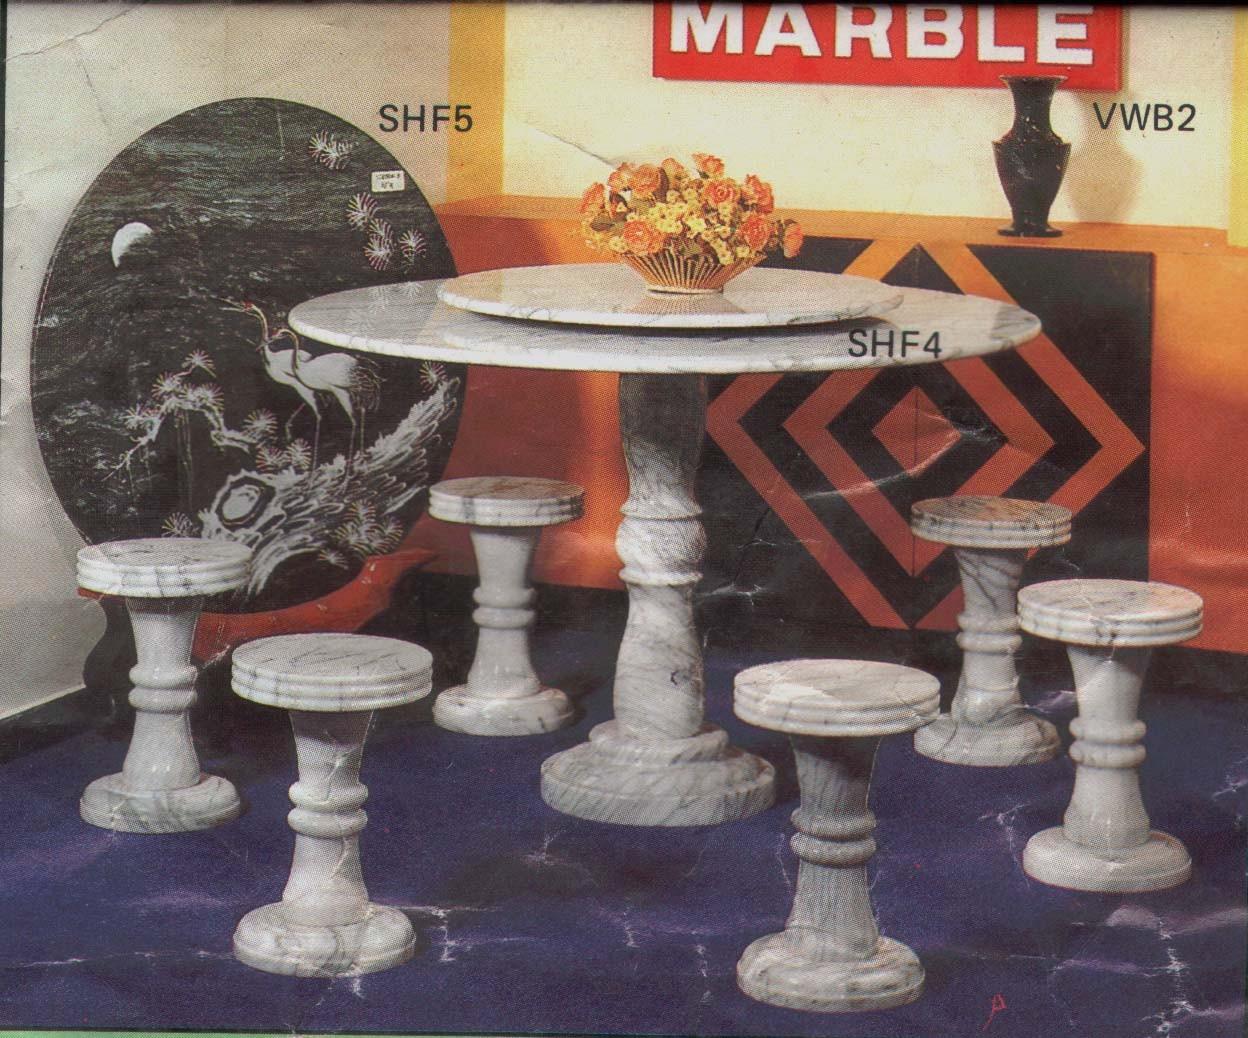 Marble round table & stools (Мраморные круглый стол & стулья)